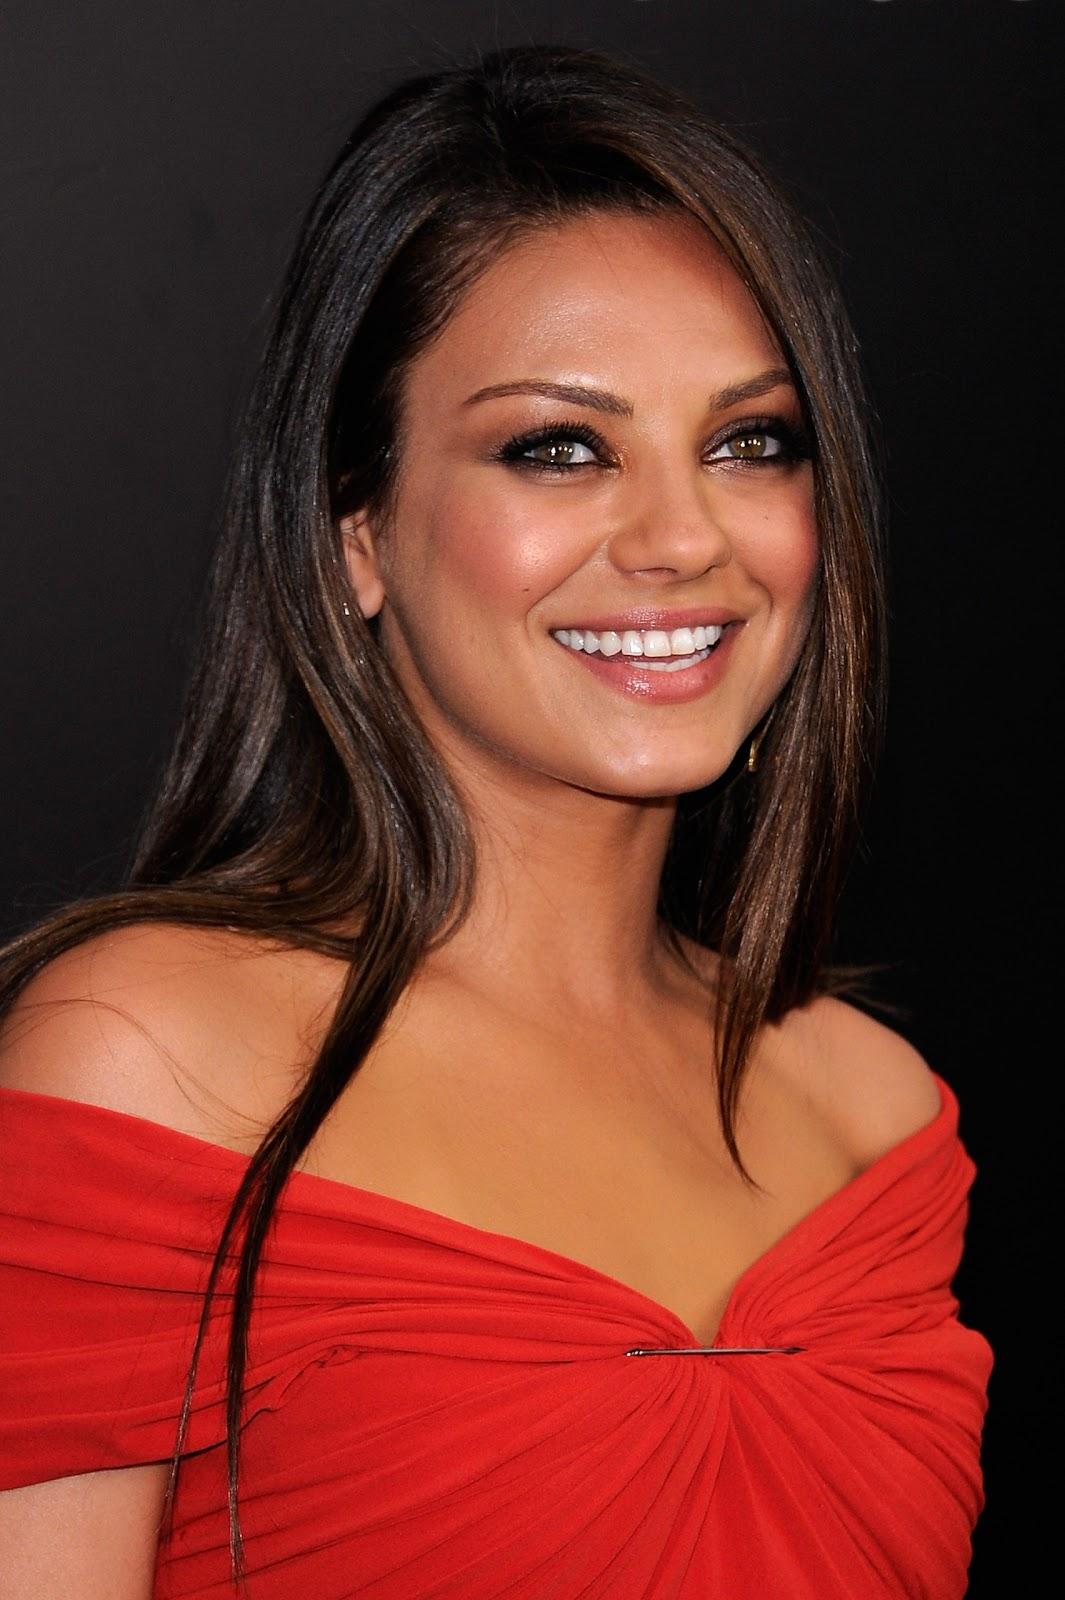 http://1.bp.blogspot.com/-t-F2gcdL45k/Tuwadq3dU-I/AAAAAAAAHhU/n7fa3N7HspE/s1600/Mila+Kunis+In+Red+Dress+%25281%2529.jpg